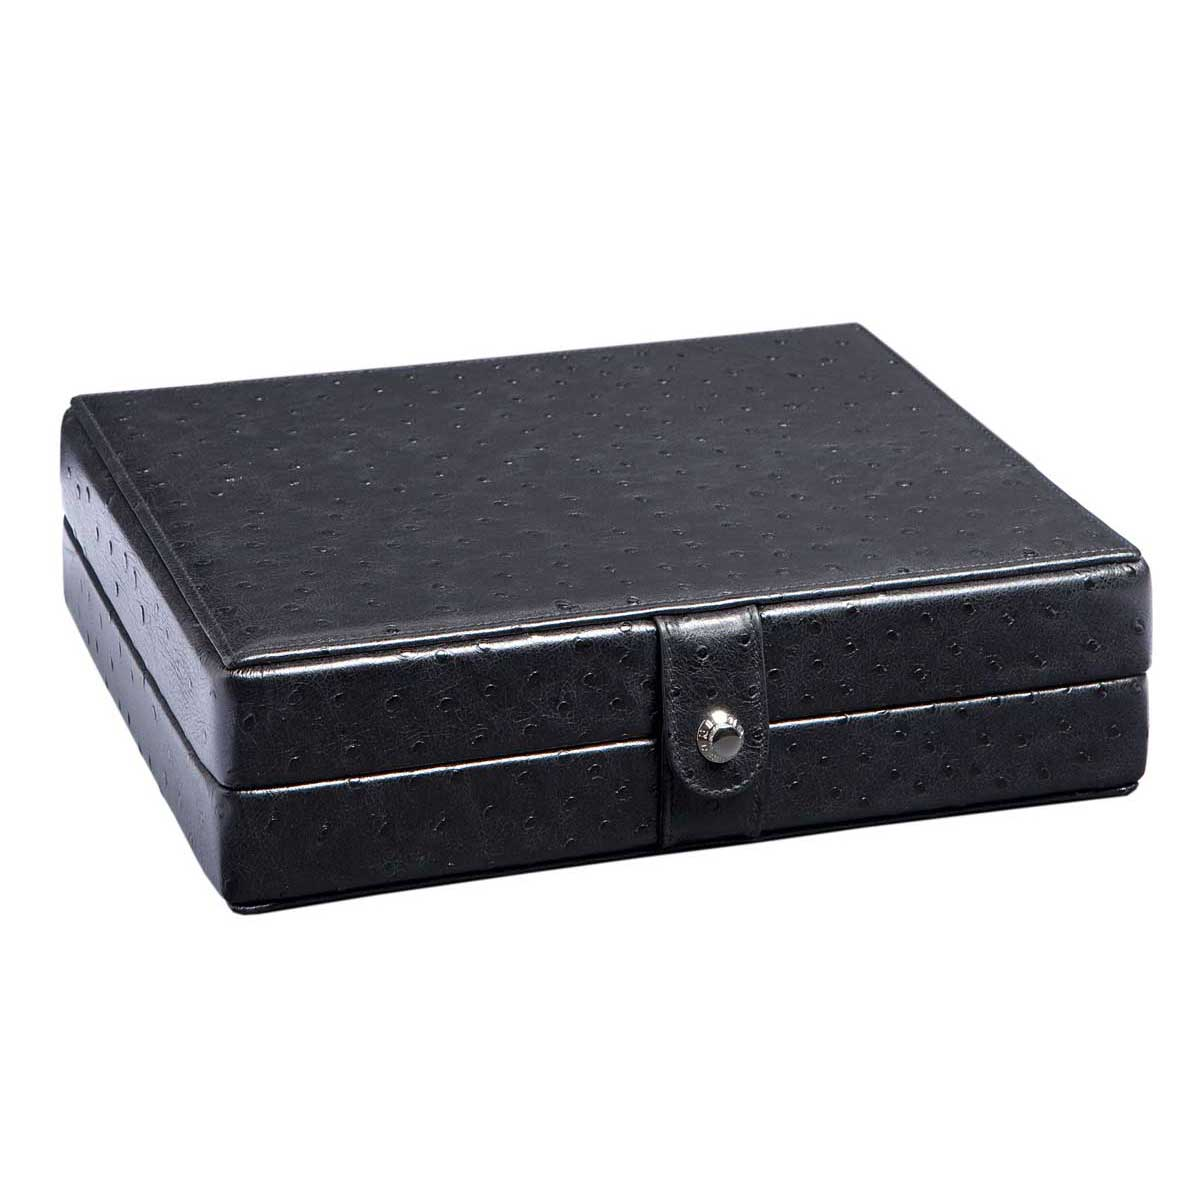 Exceptionnel Underwood 10 Watch Leather Storage Box Features A Micro Fiber Interior To  Inhibit Oxidation.